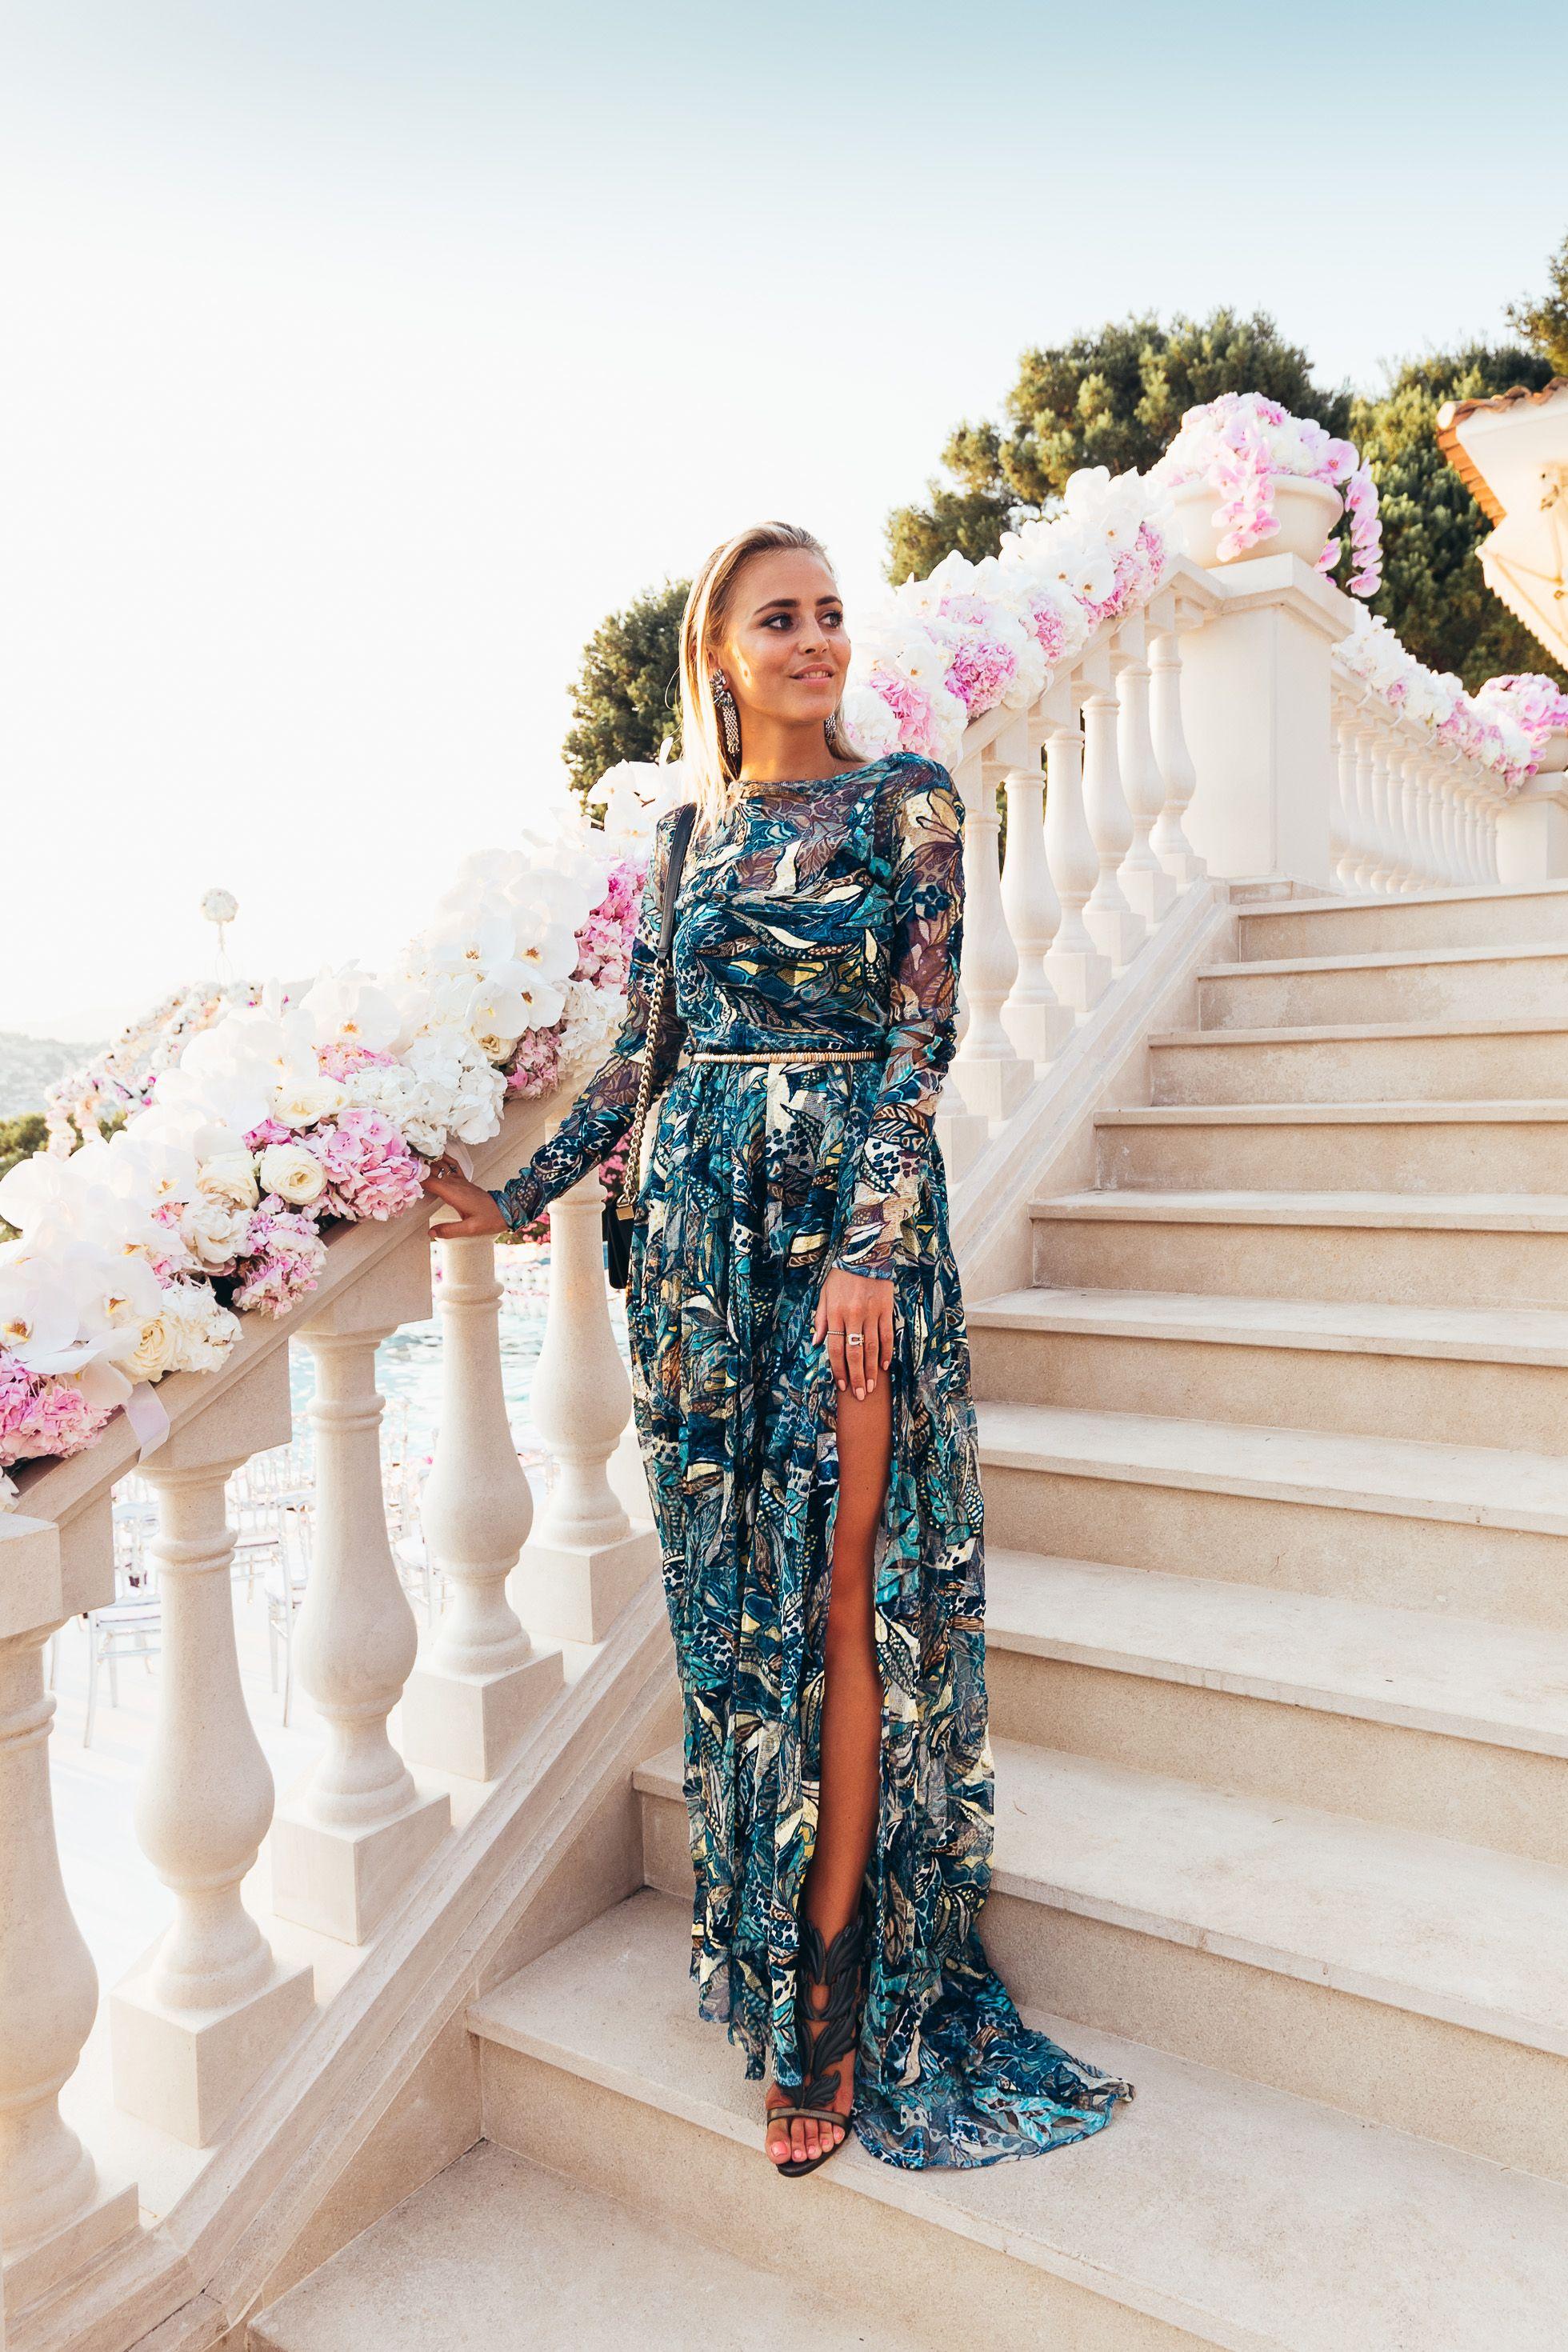 e58ea33e01ca Frida Jonsvens dress/ Chanel bag/ Giuseppe Zanotti shoes God morgon babes!  Sent…